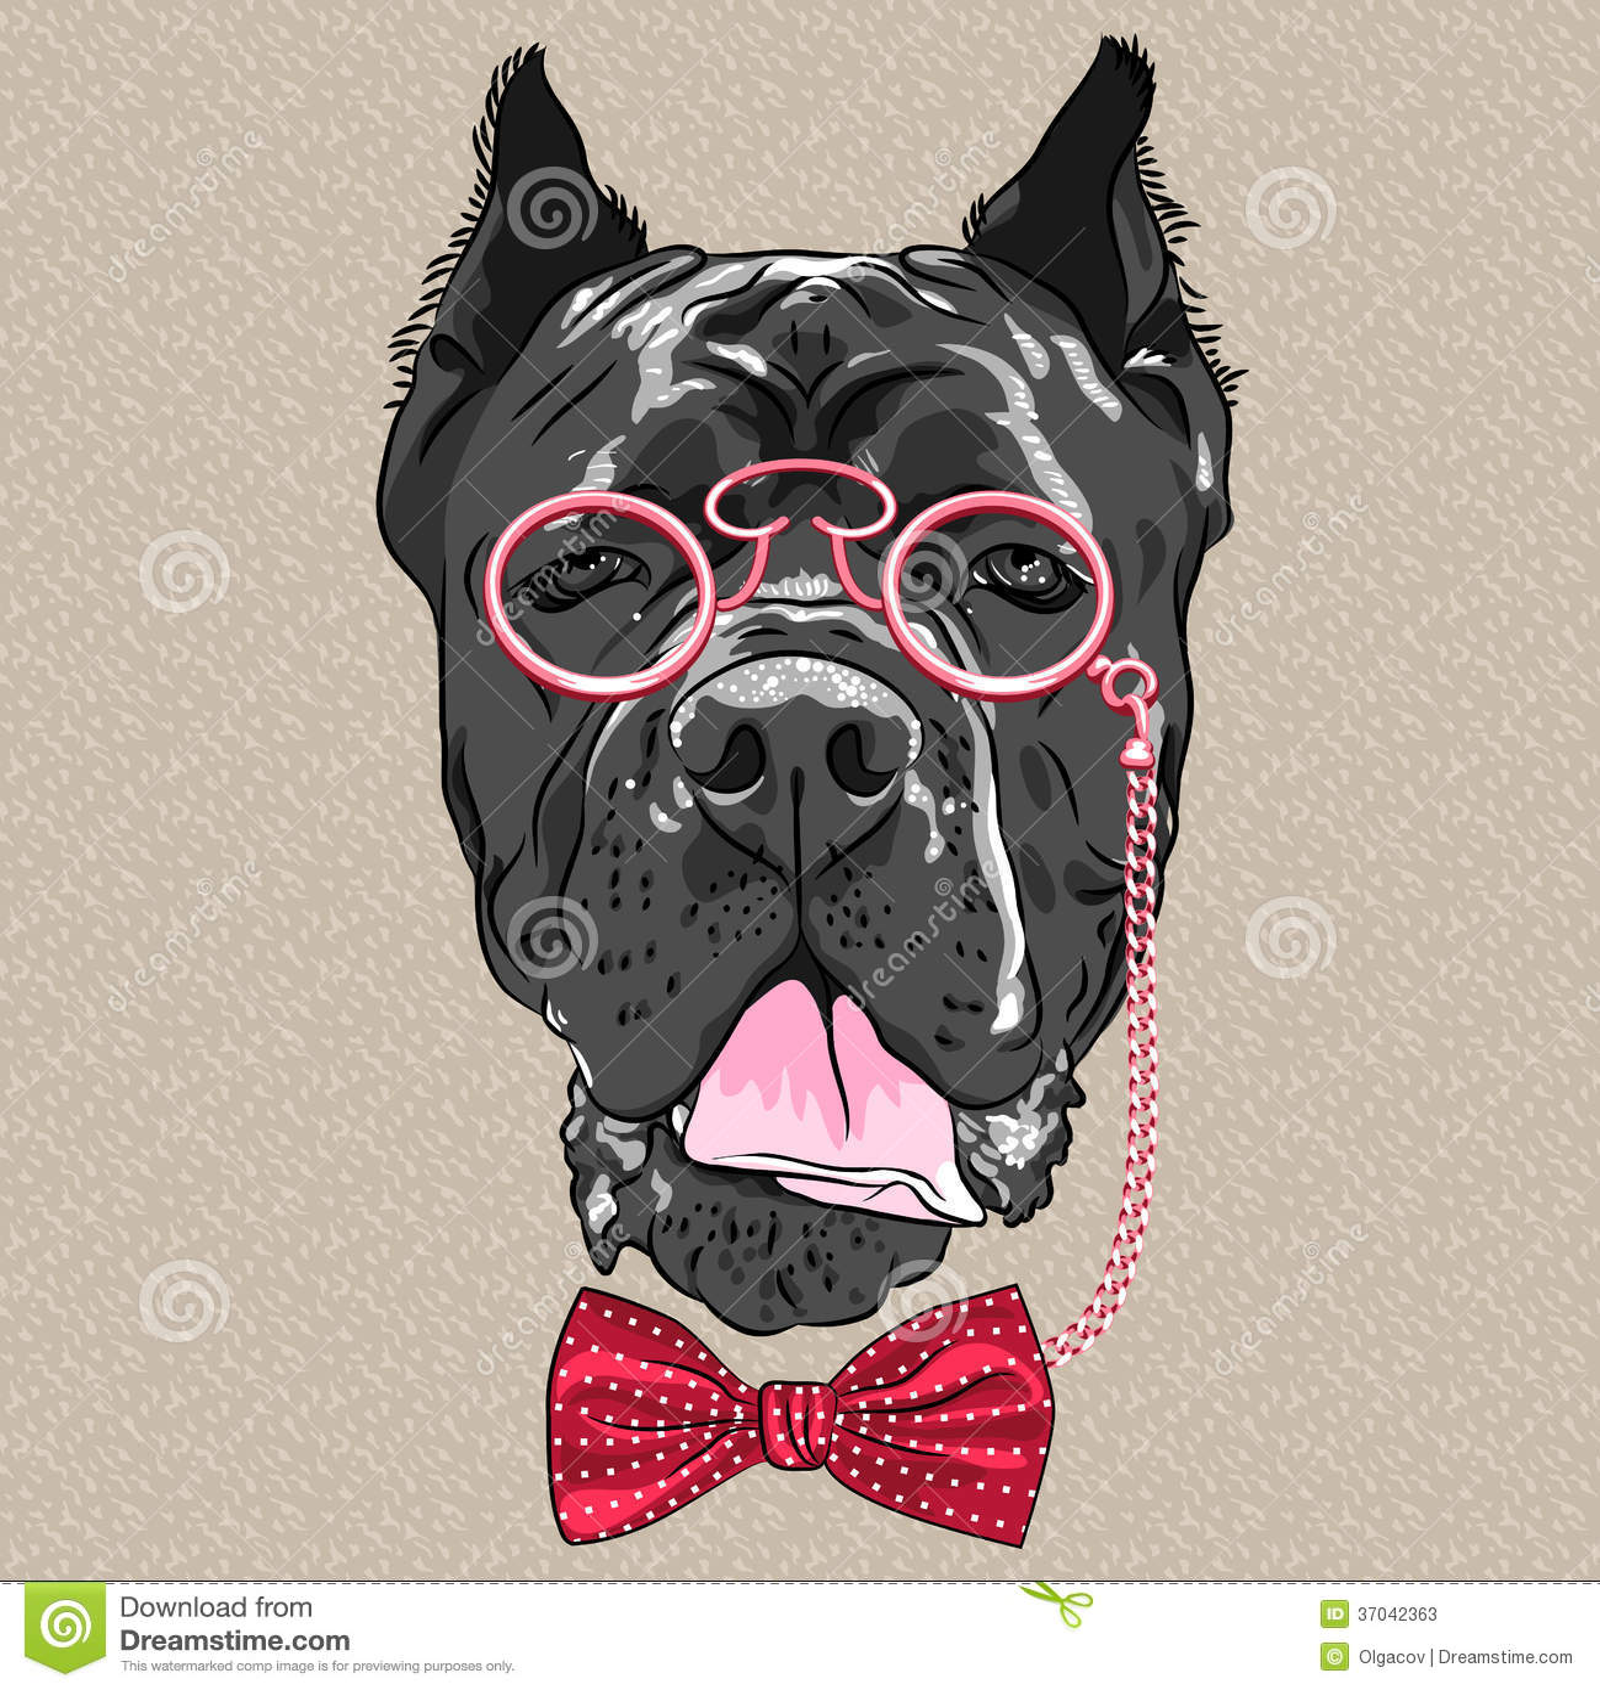 Cartoon Dog In Glasses